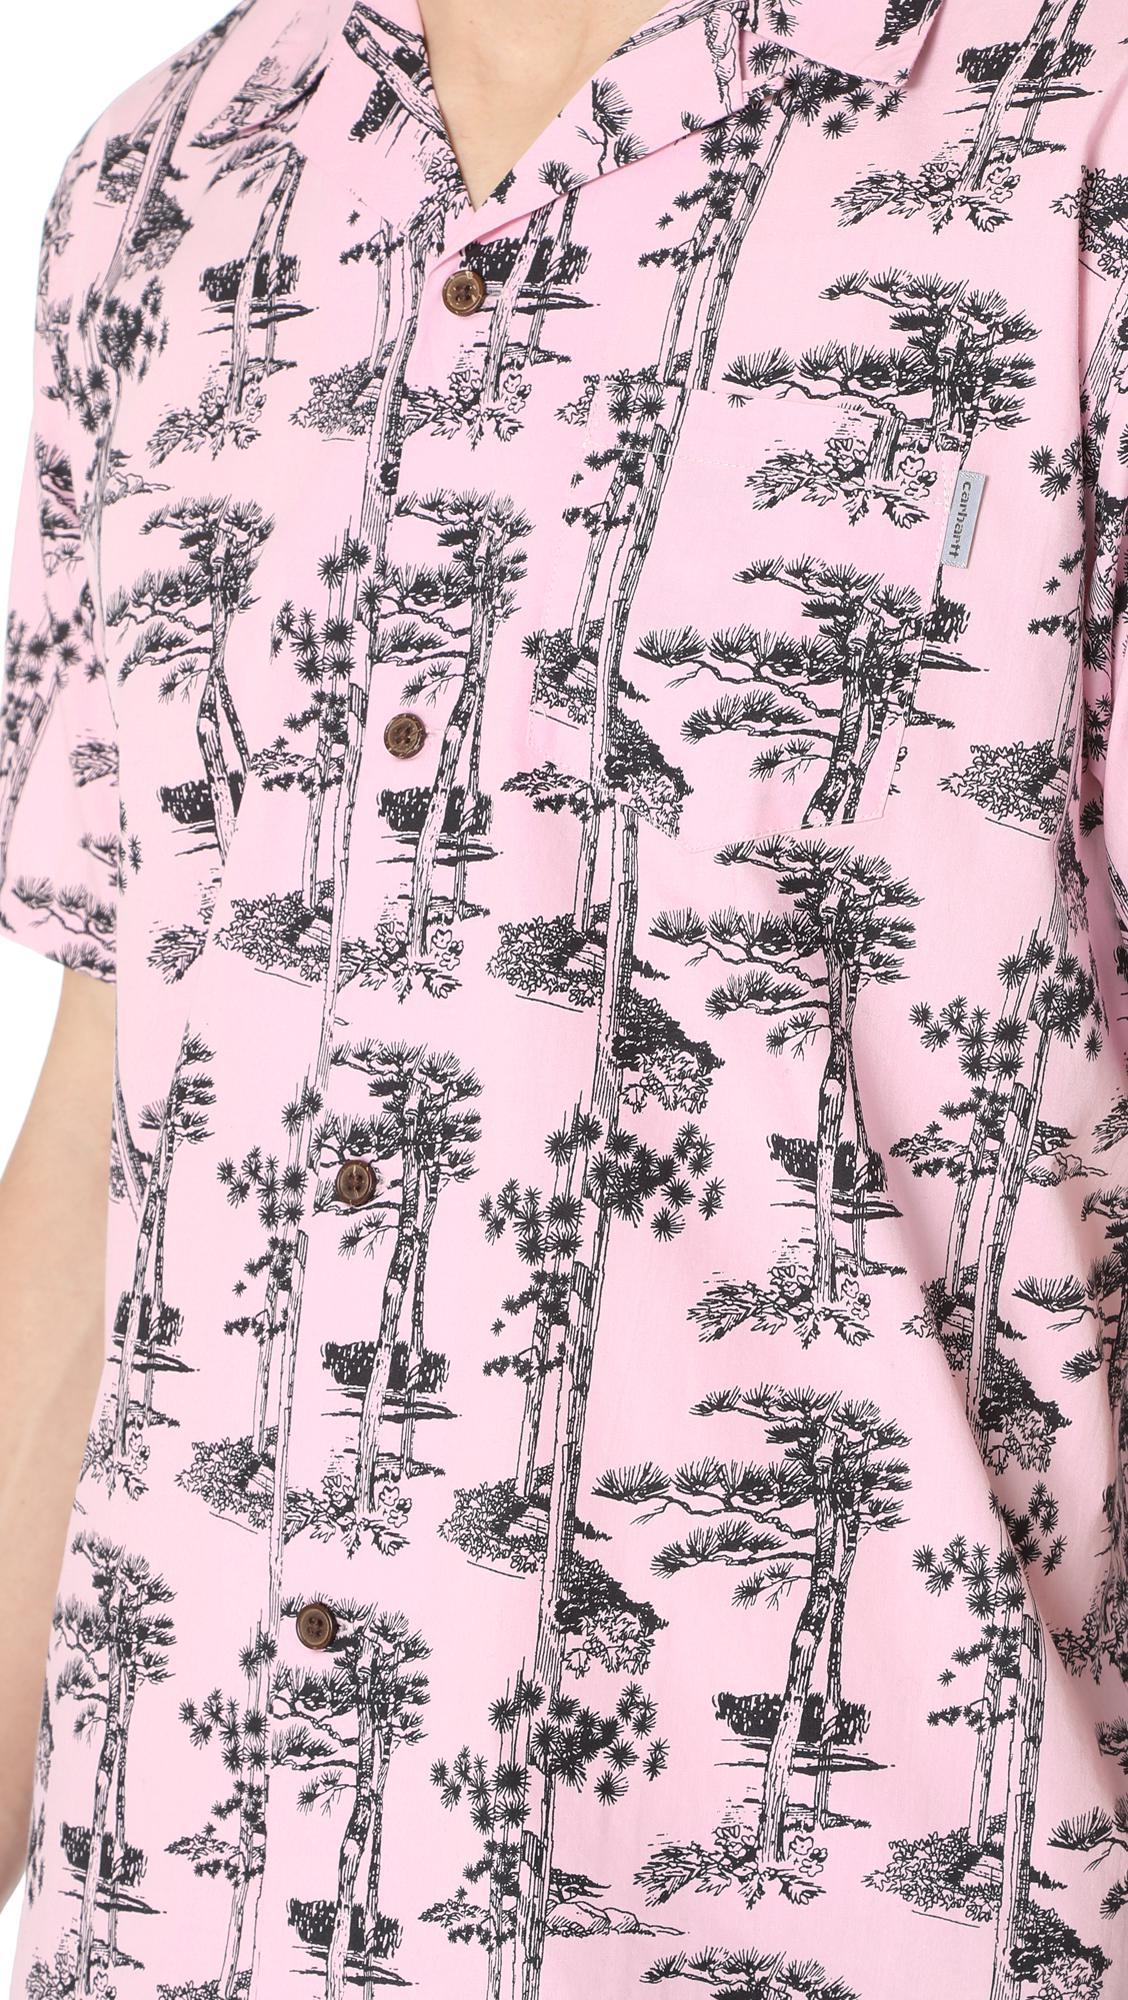 a6efa83e Lyst - Carhartt WIP Short Sleeve Pine Hawaii Shirt in Pink for Men